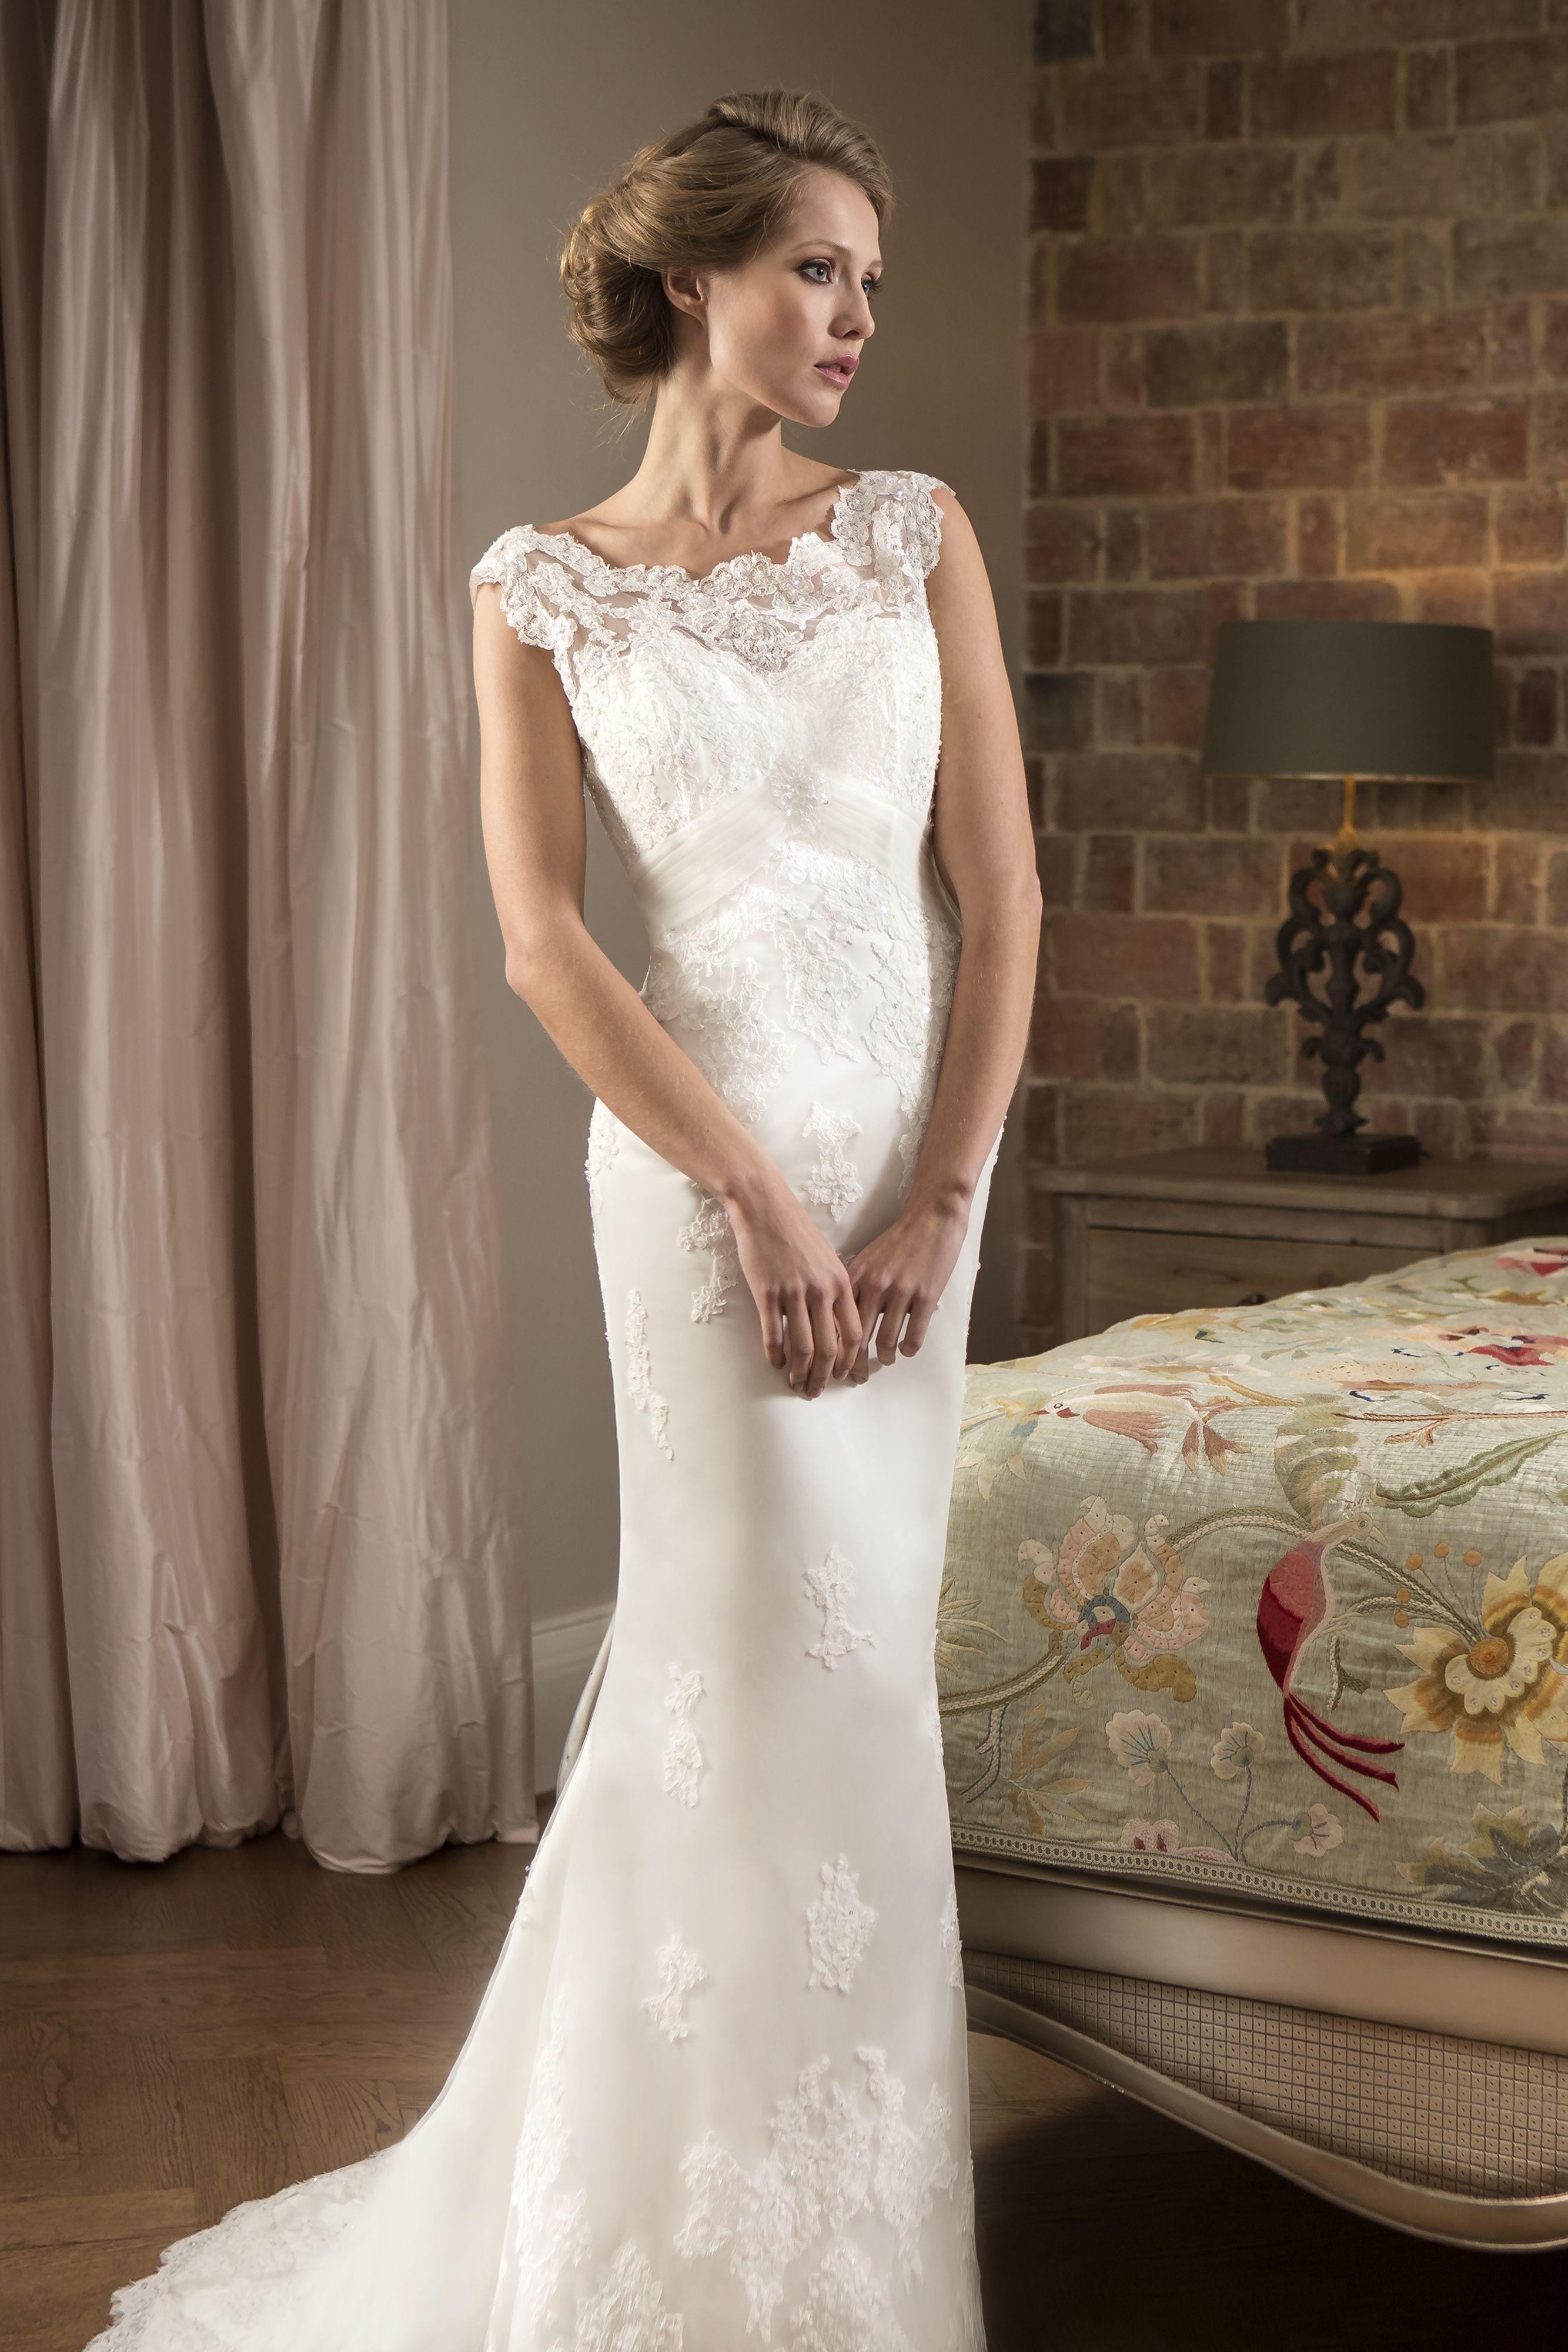 True bride w134 true bride w134 slim lace bridal gown for Boat neck lace wedding dress